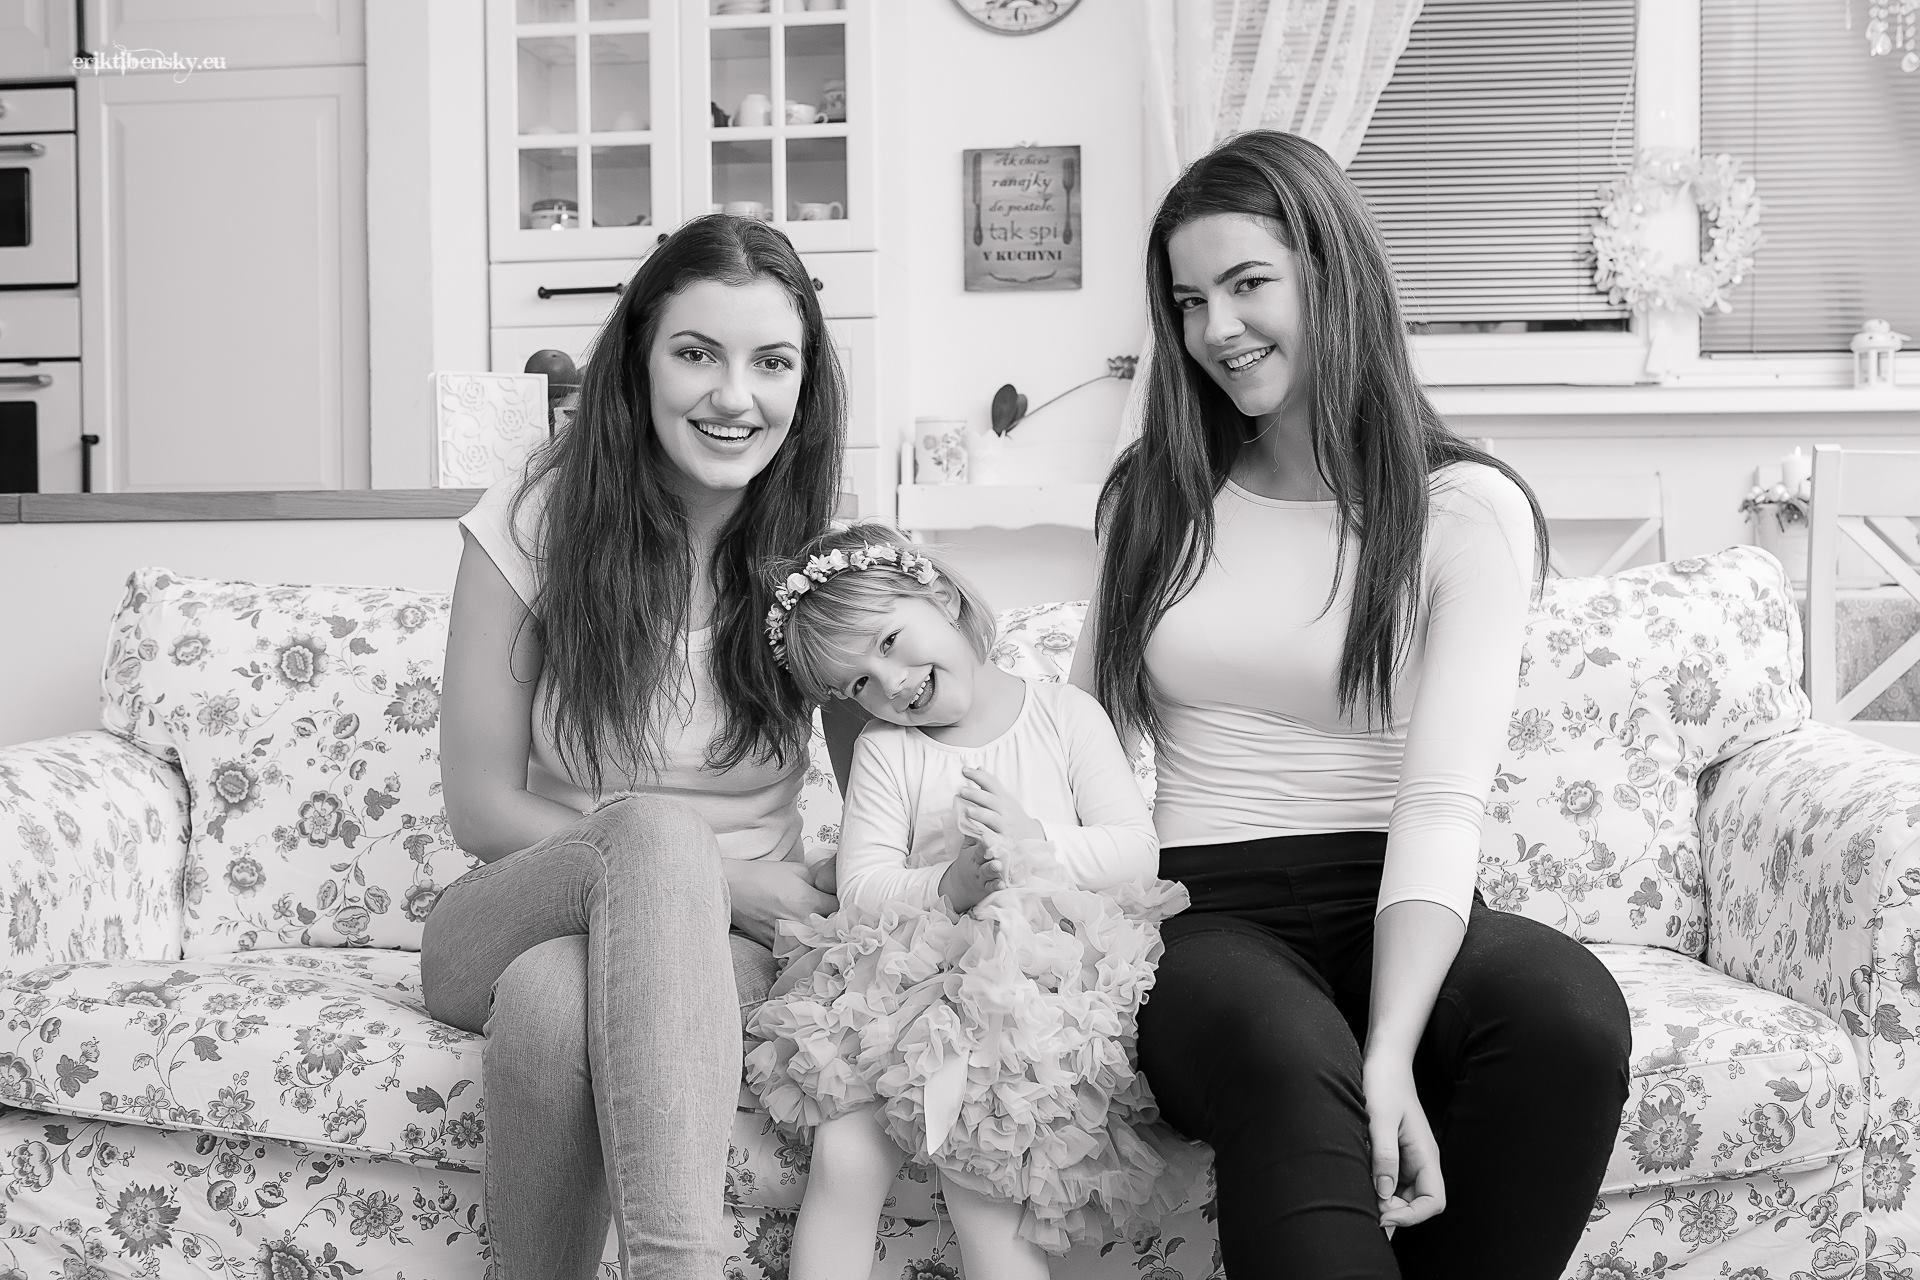 eriktibensky-eu-fotograf-home-photo-family-rodina-kids-deti-1010